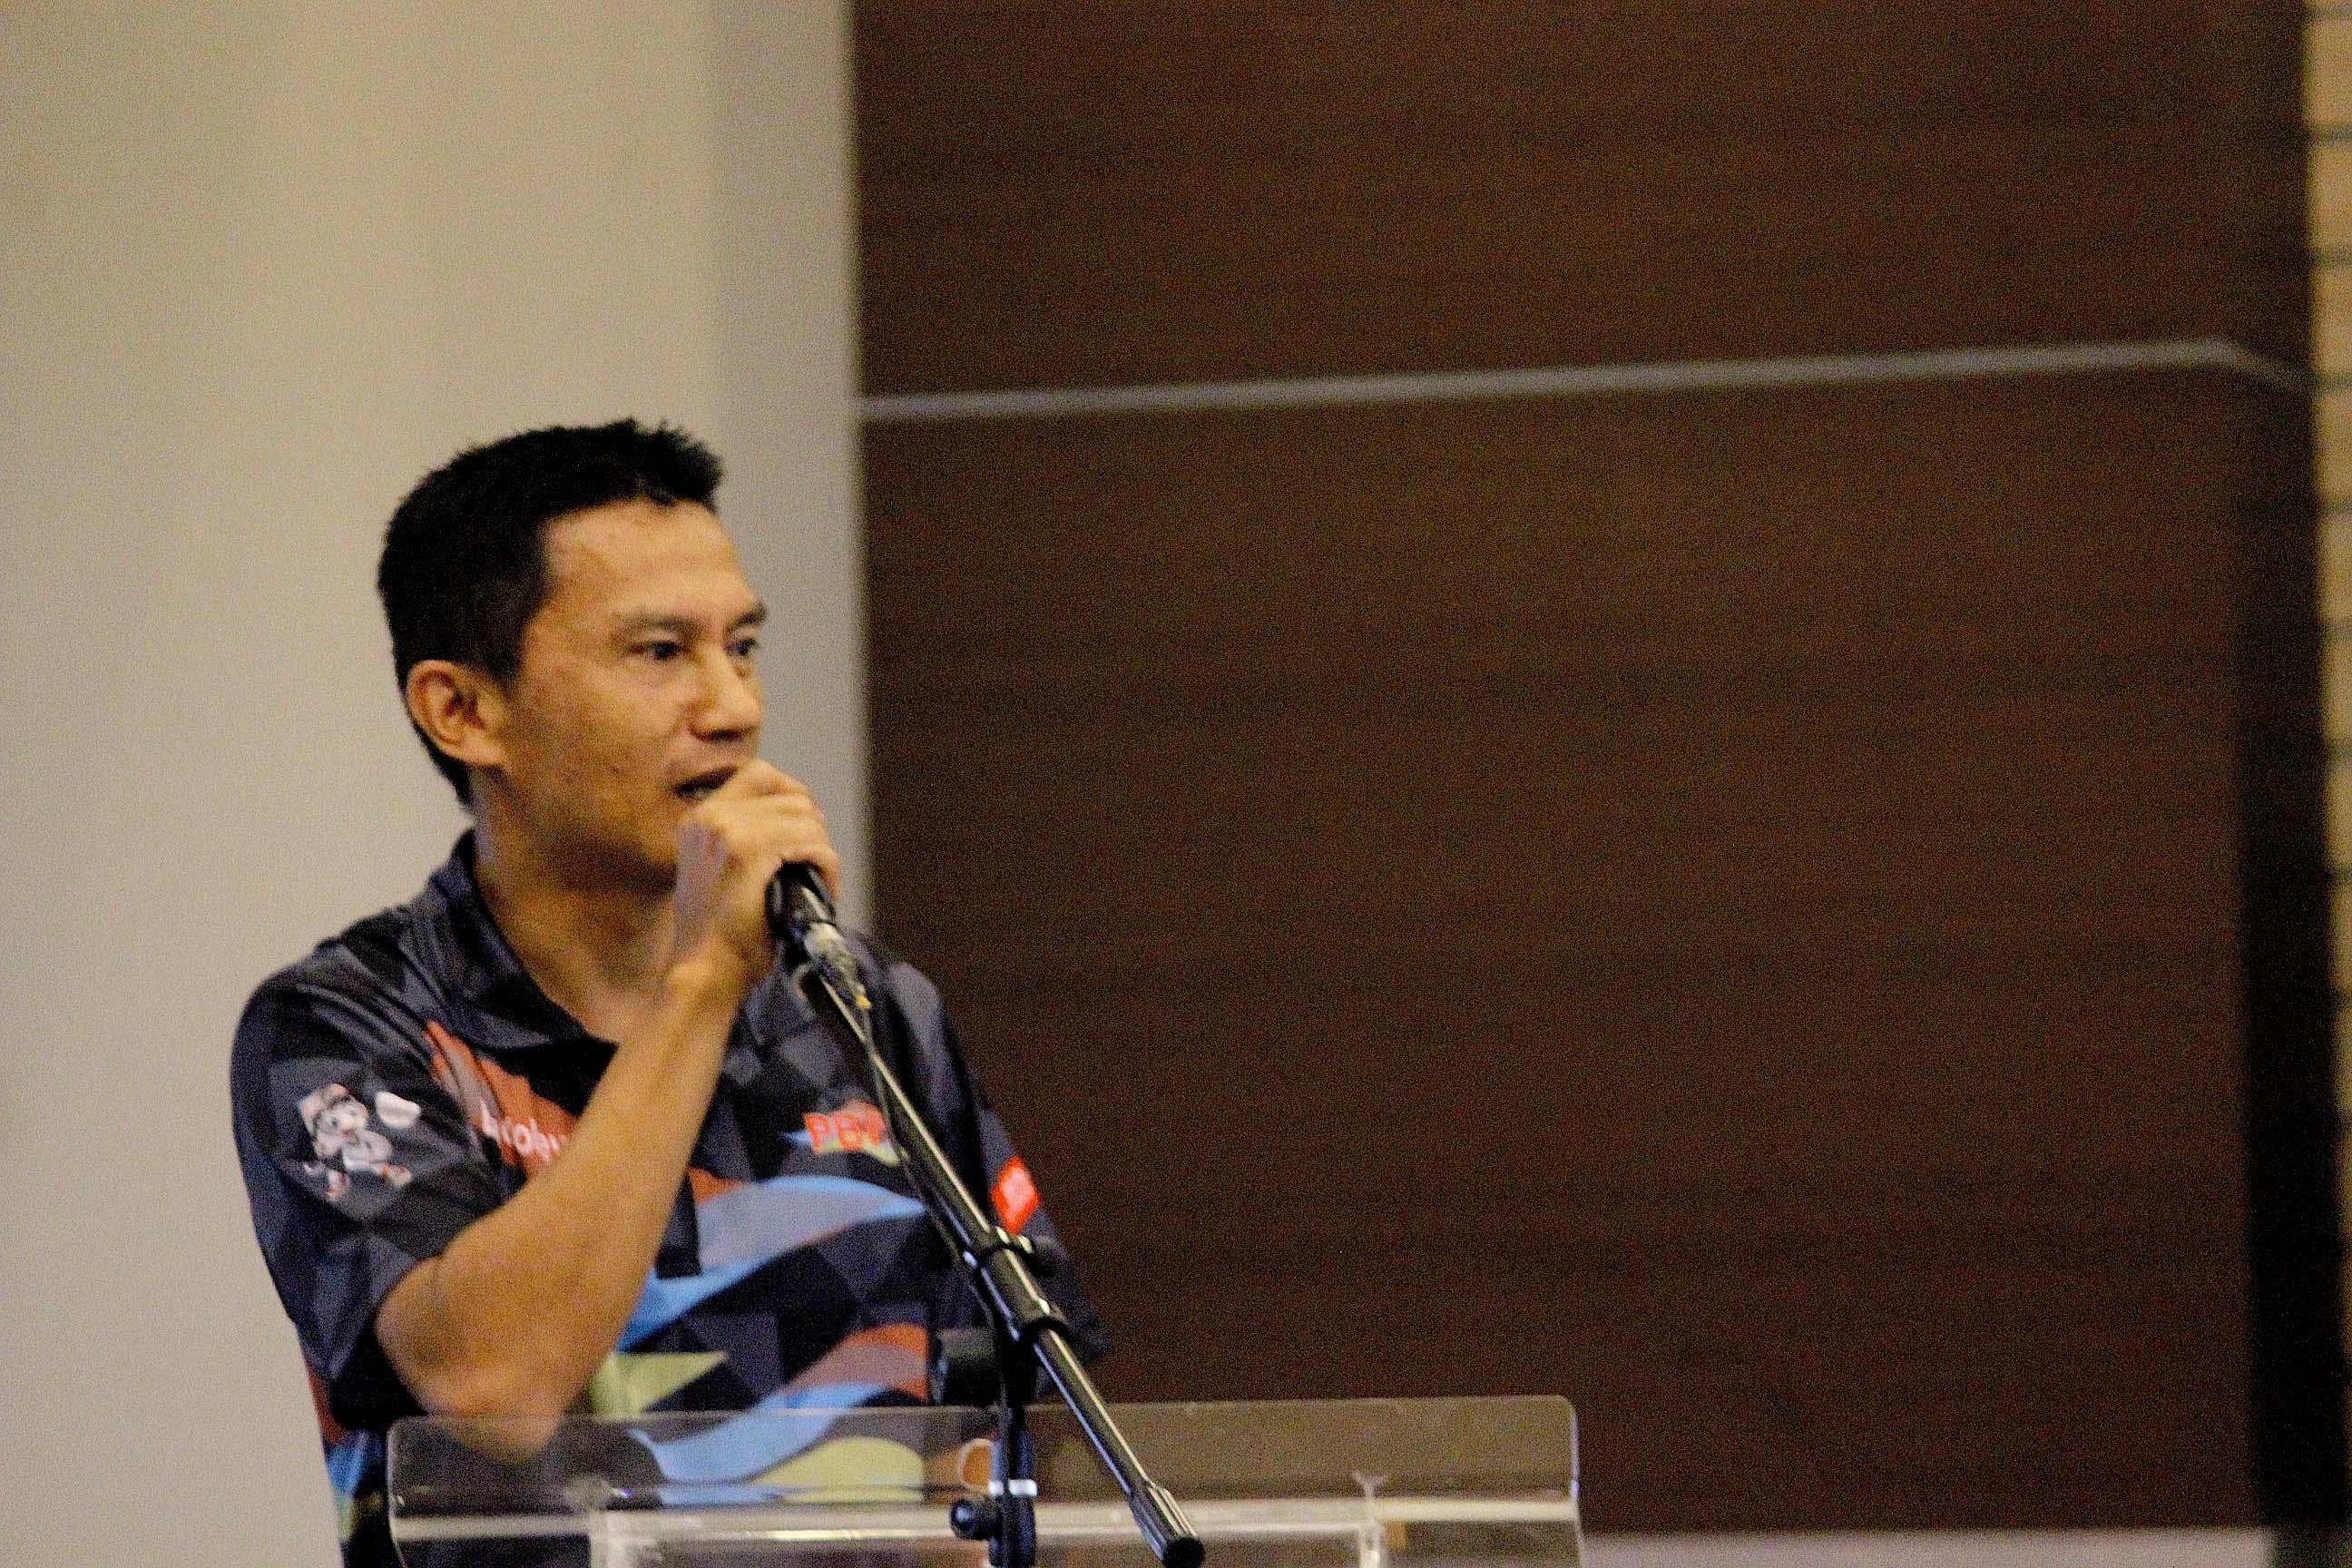 Nur Abdulah selaku perwakilan pemberintah memberikan kata sambutan di acara Kongres Asosiasi futsal kota Depok di gedung Debaleka LT.10 (19/01/19)